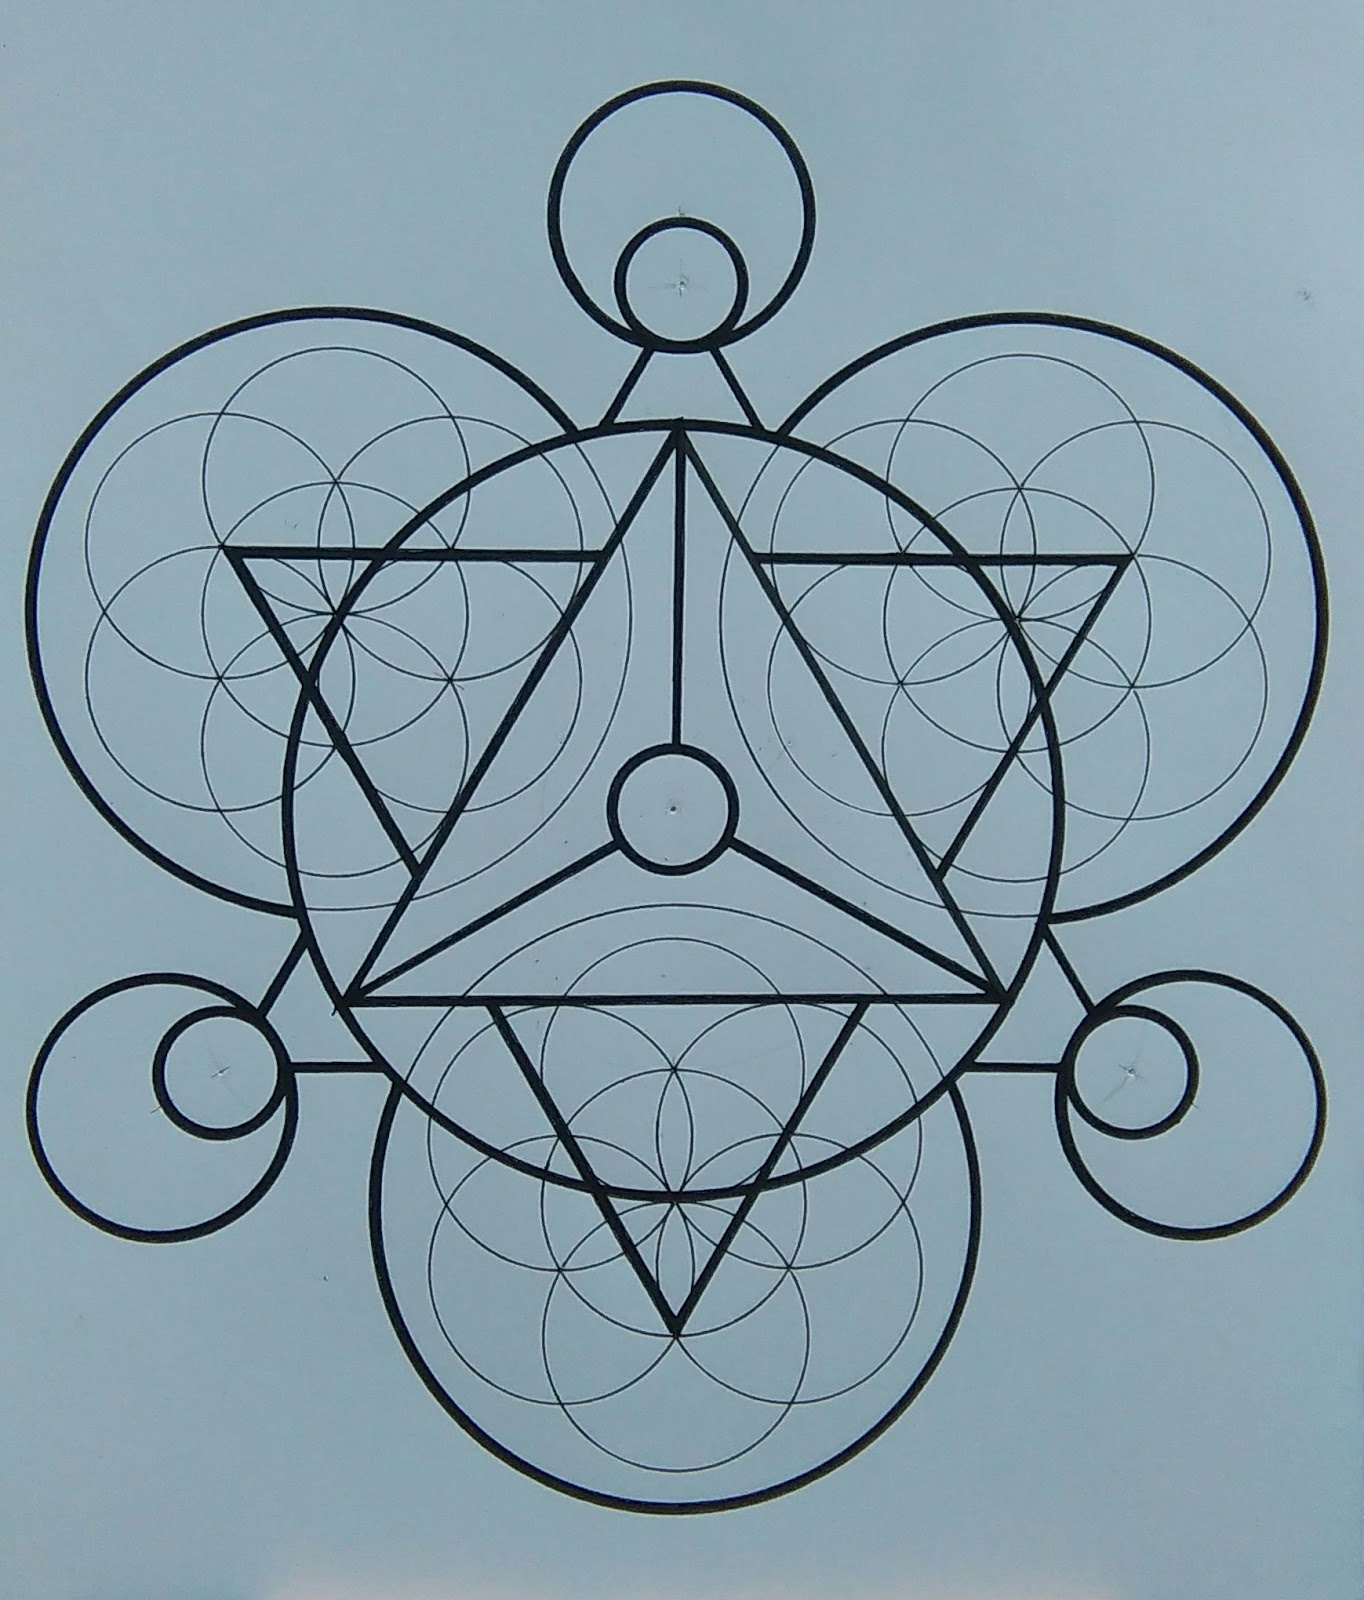 [SPOLYK] - Geometries & sketches - Page 6 Version%2B2